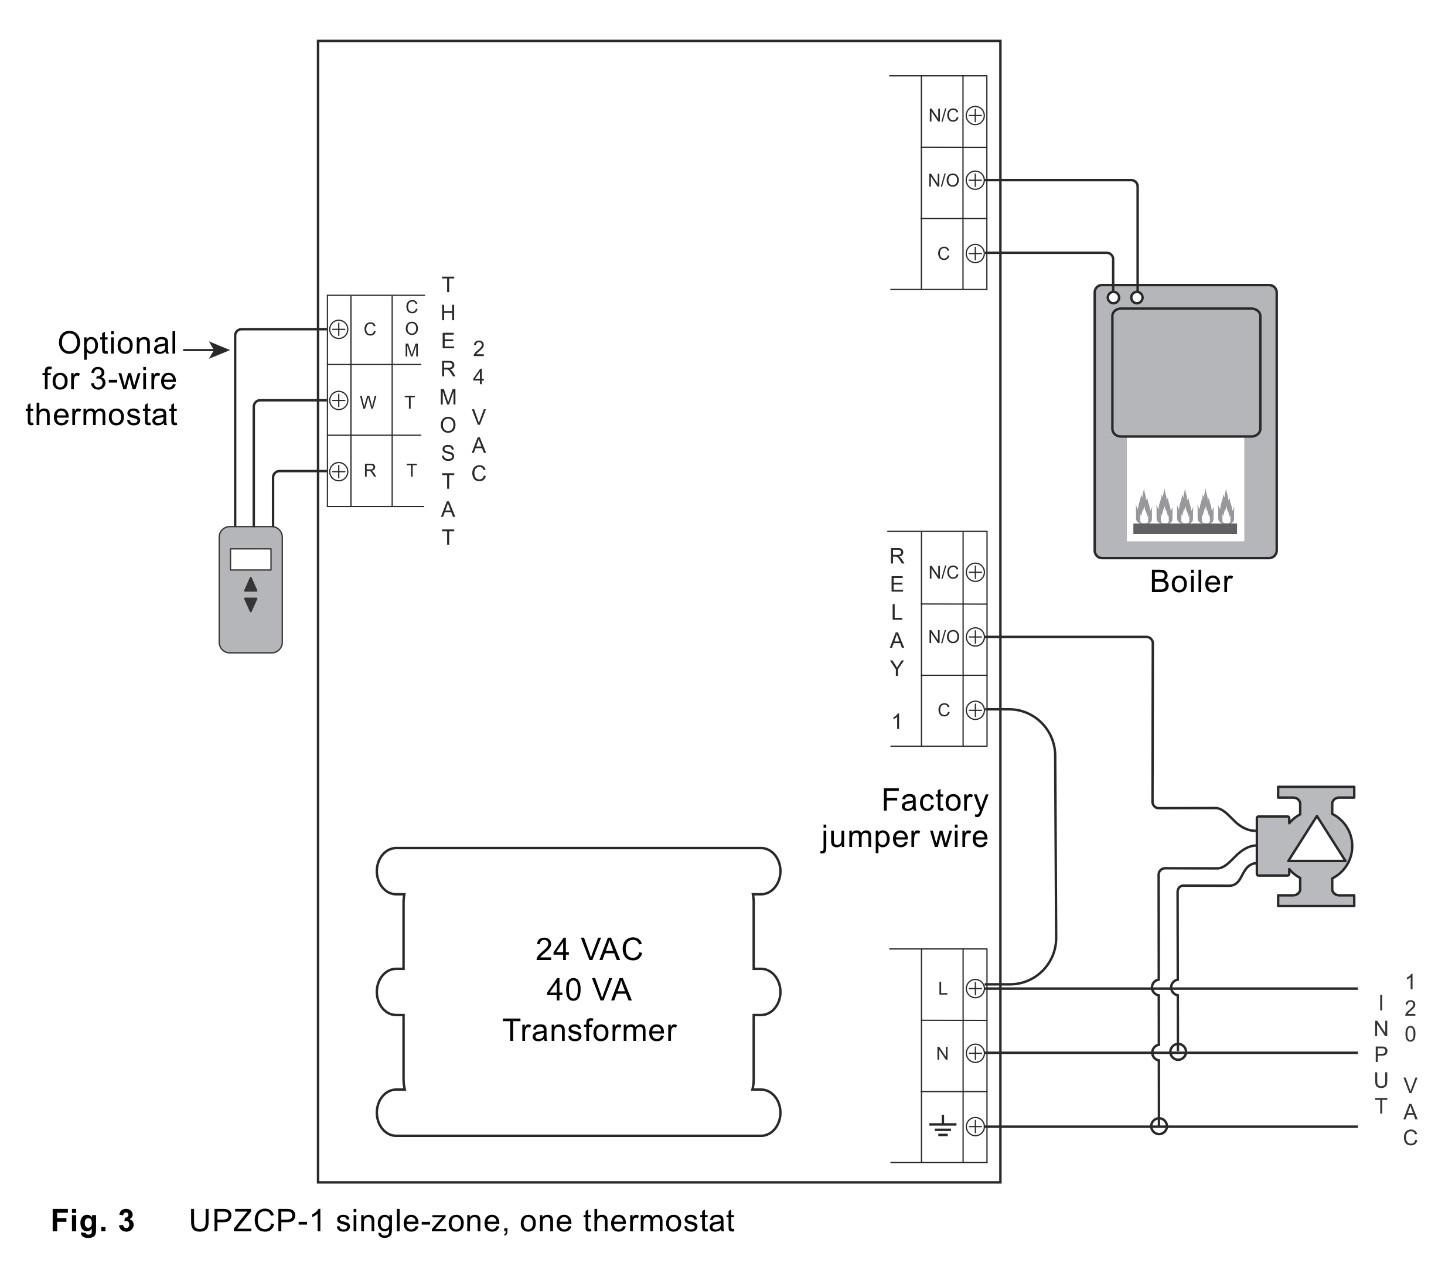 Shop Vac Switch Wiring Diagram